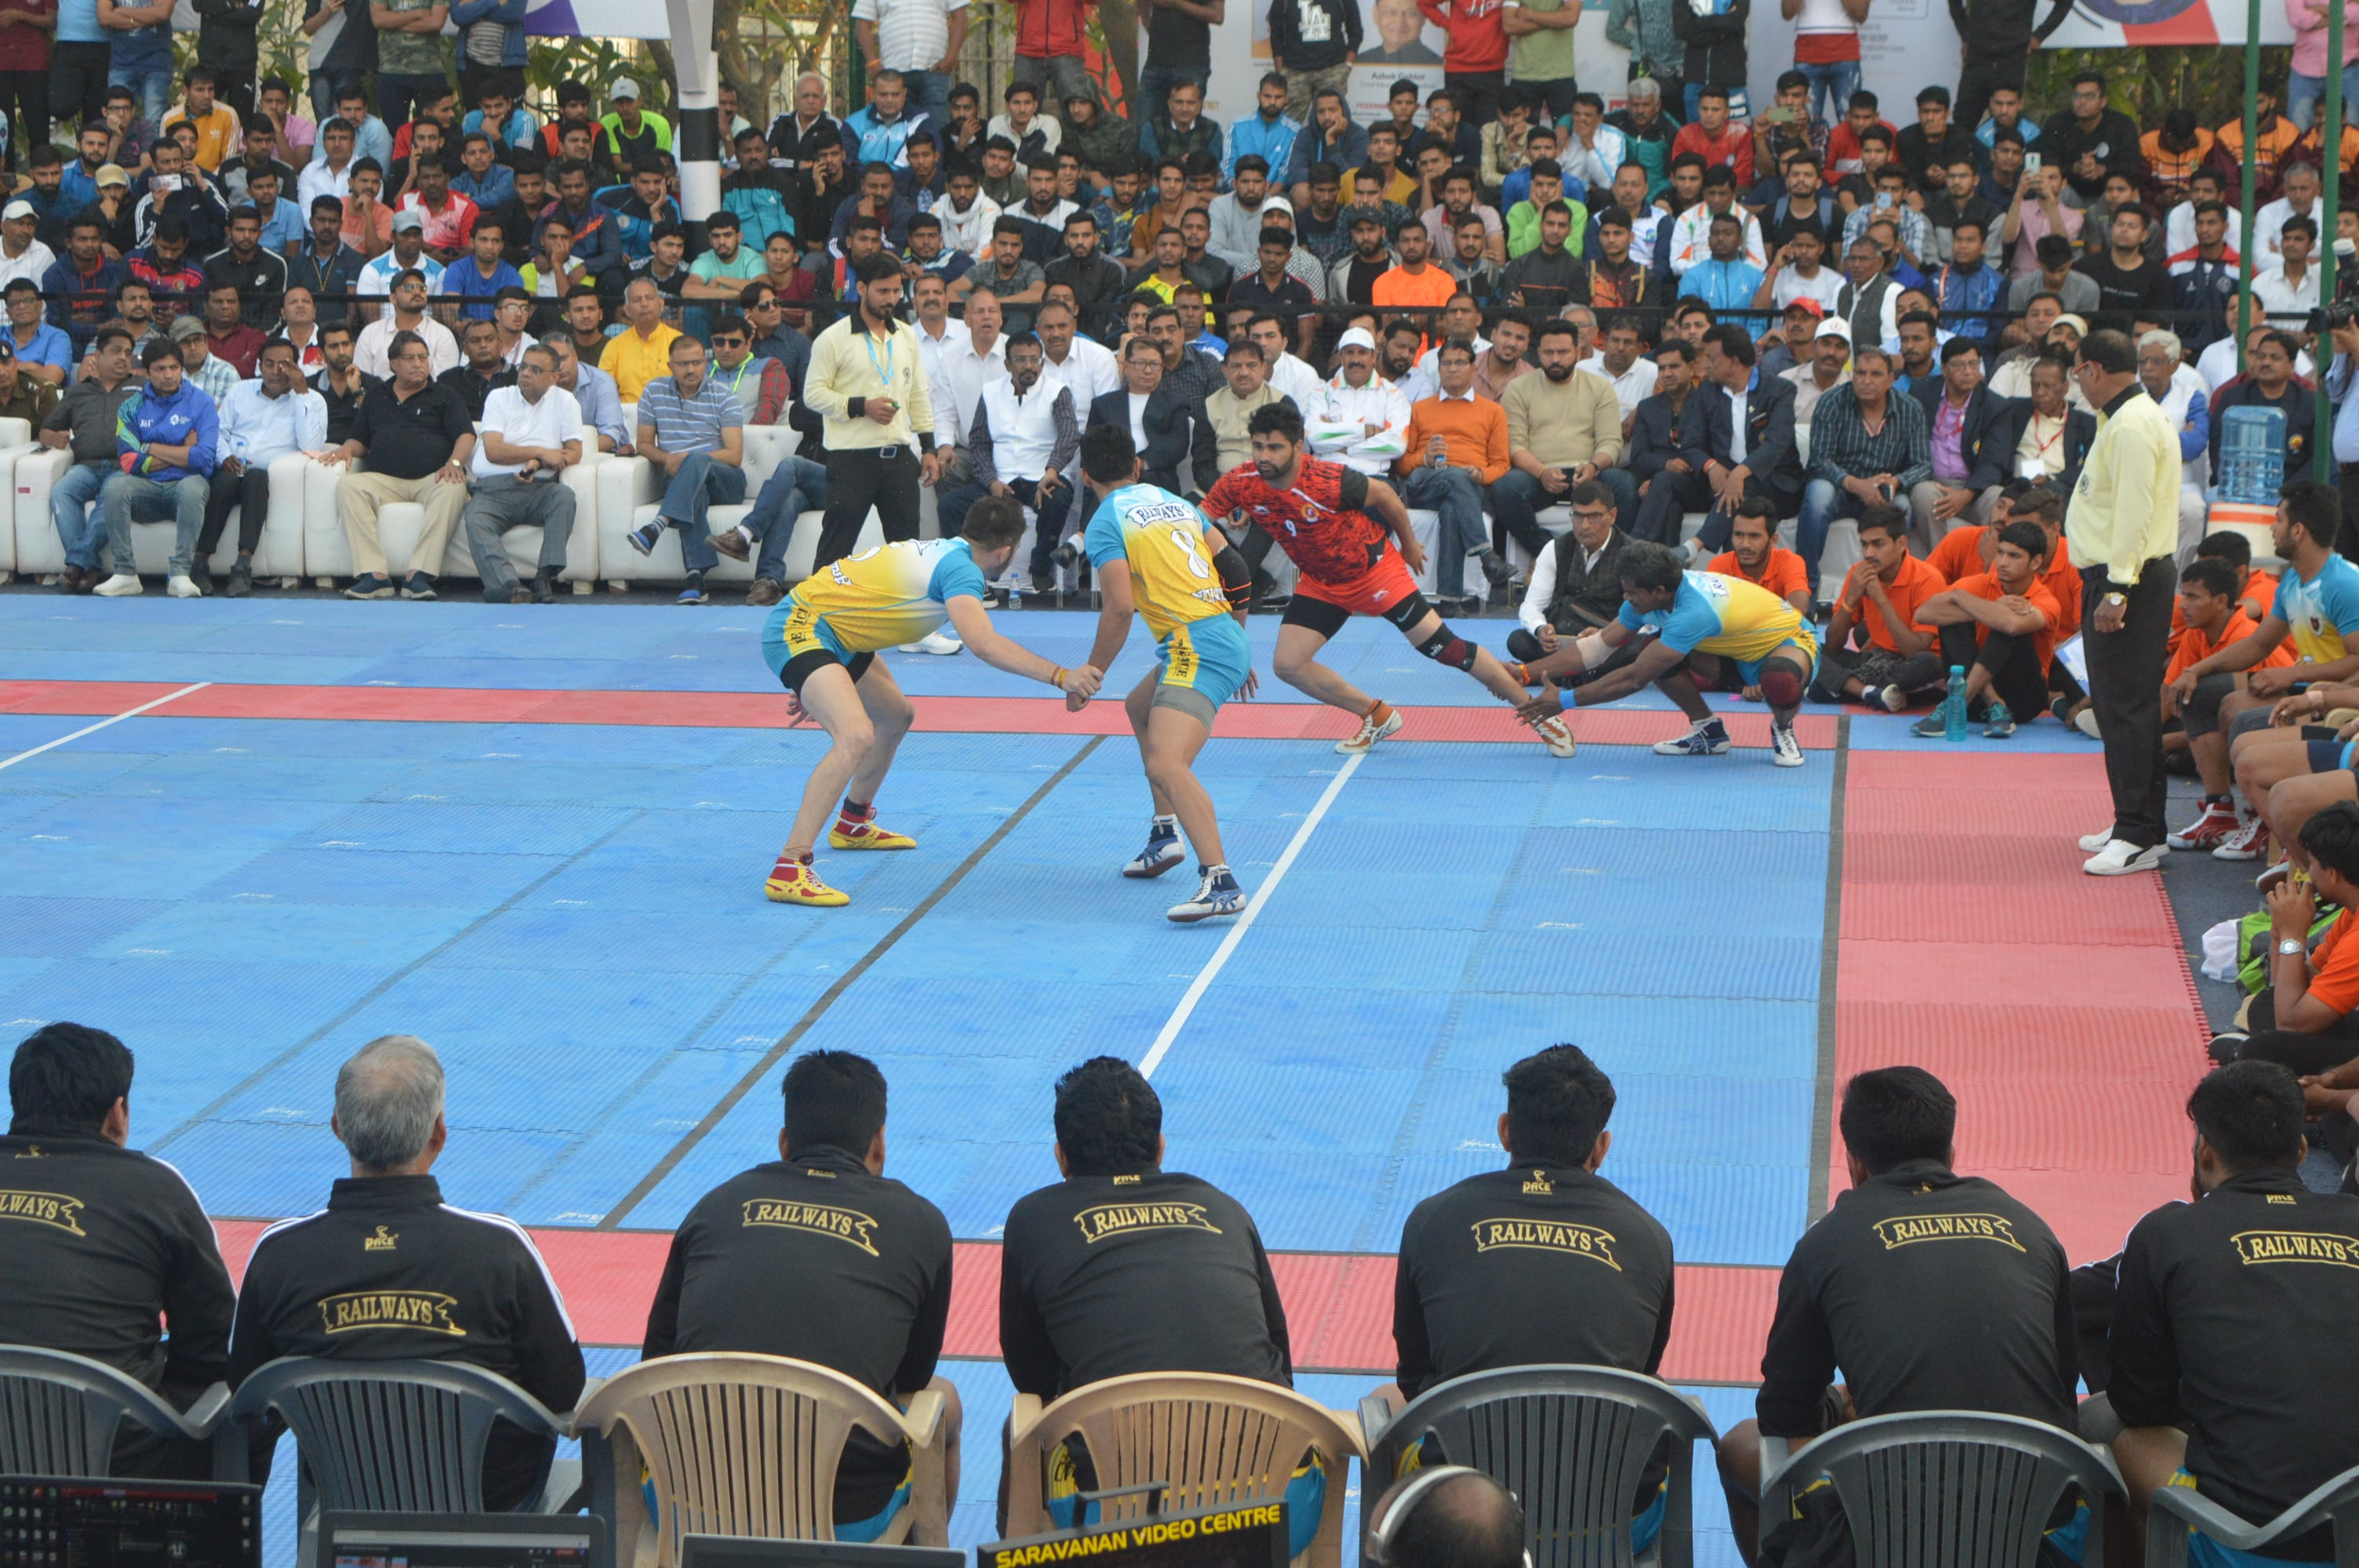 Pardeep Narwal being tackled by Dharmaraj Cheralathan